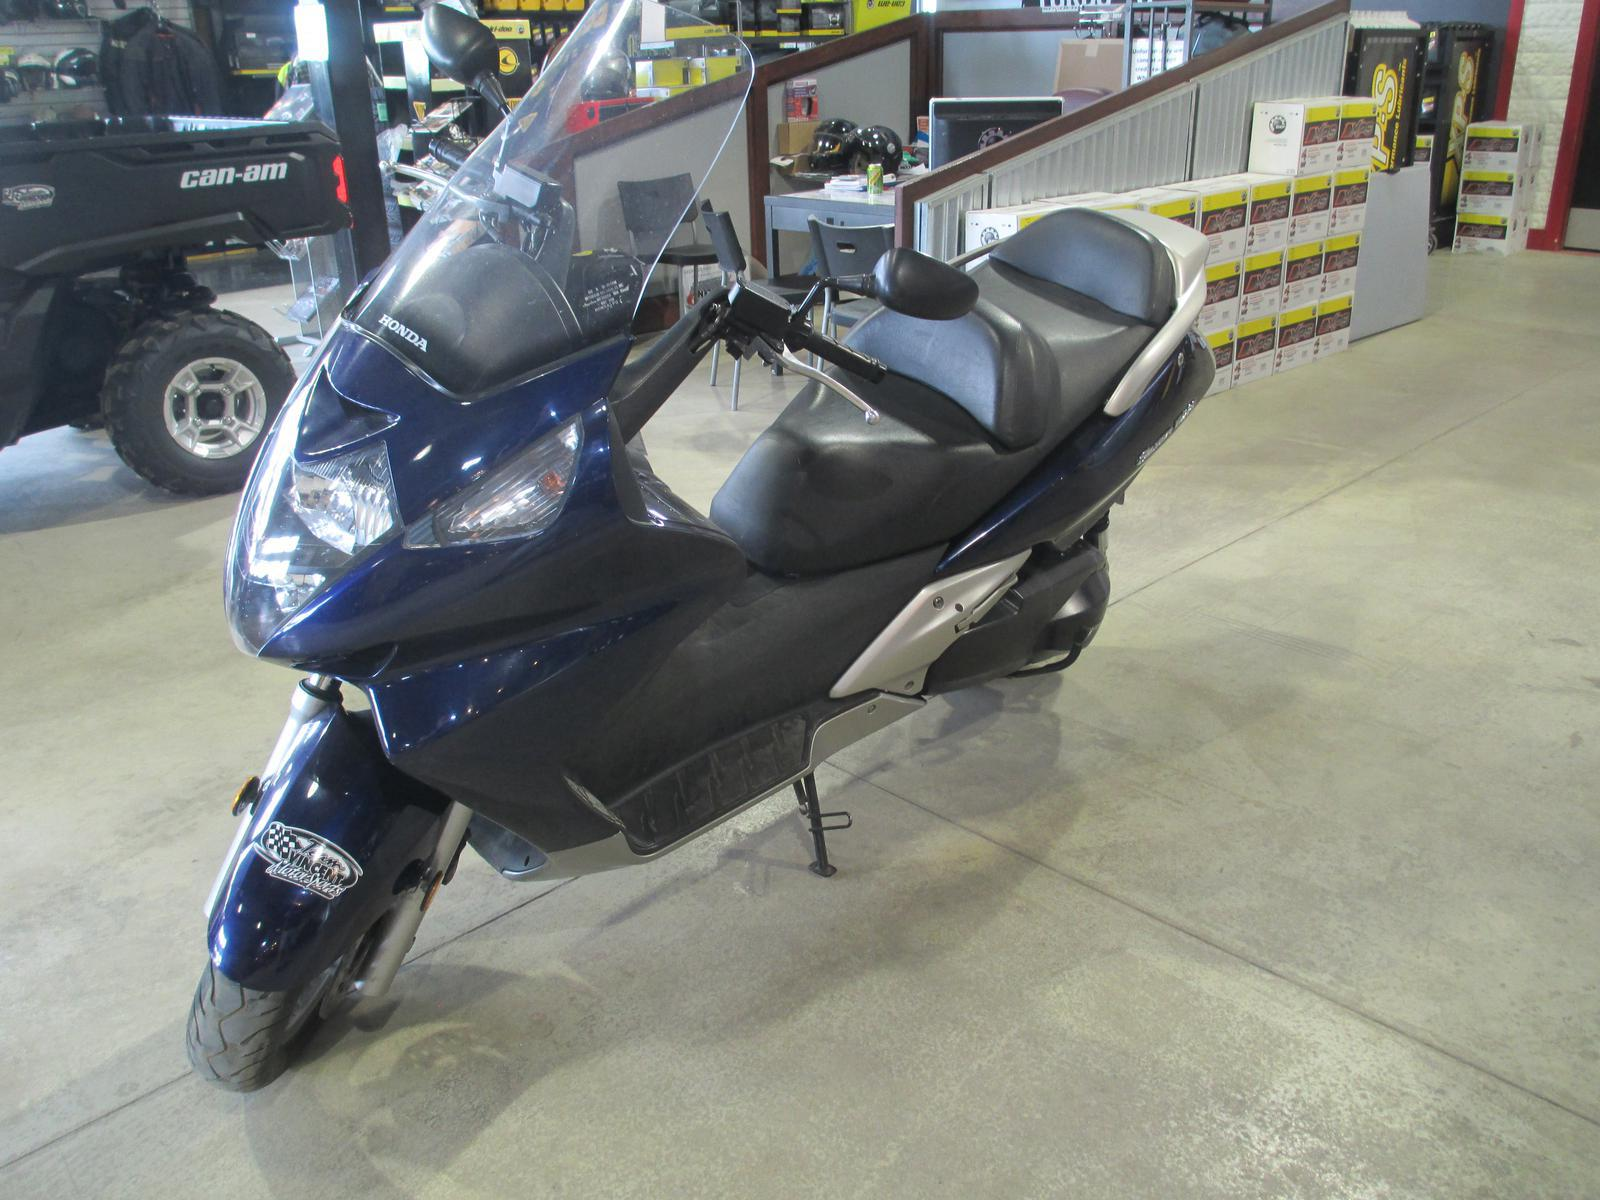 2006 Honda SILVERWING 600 | 2 of 4